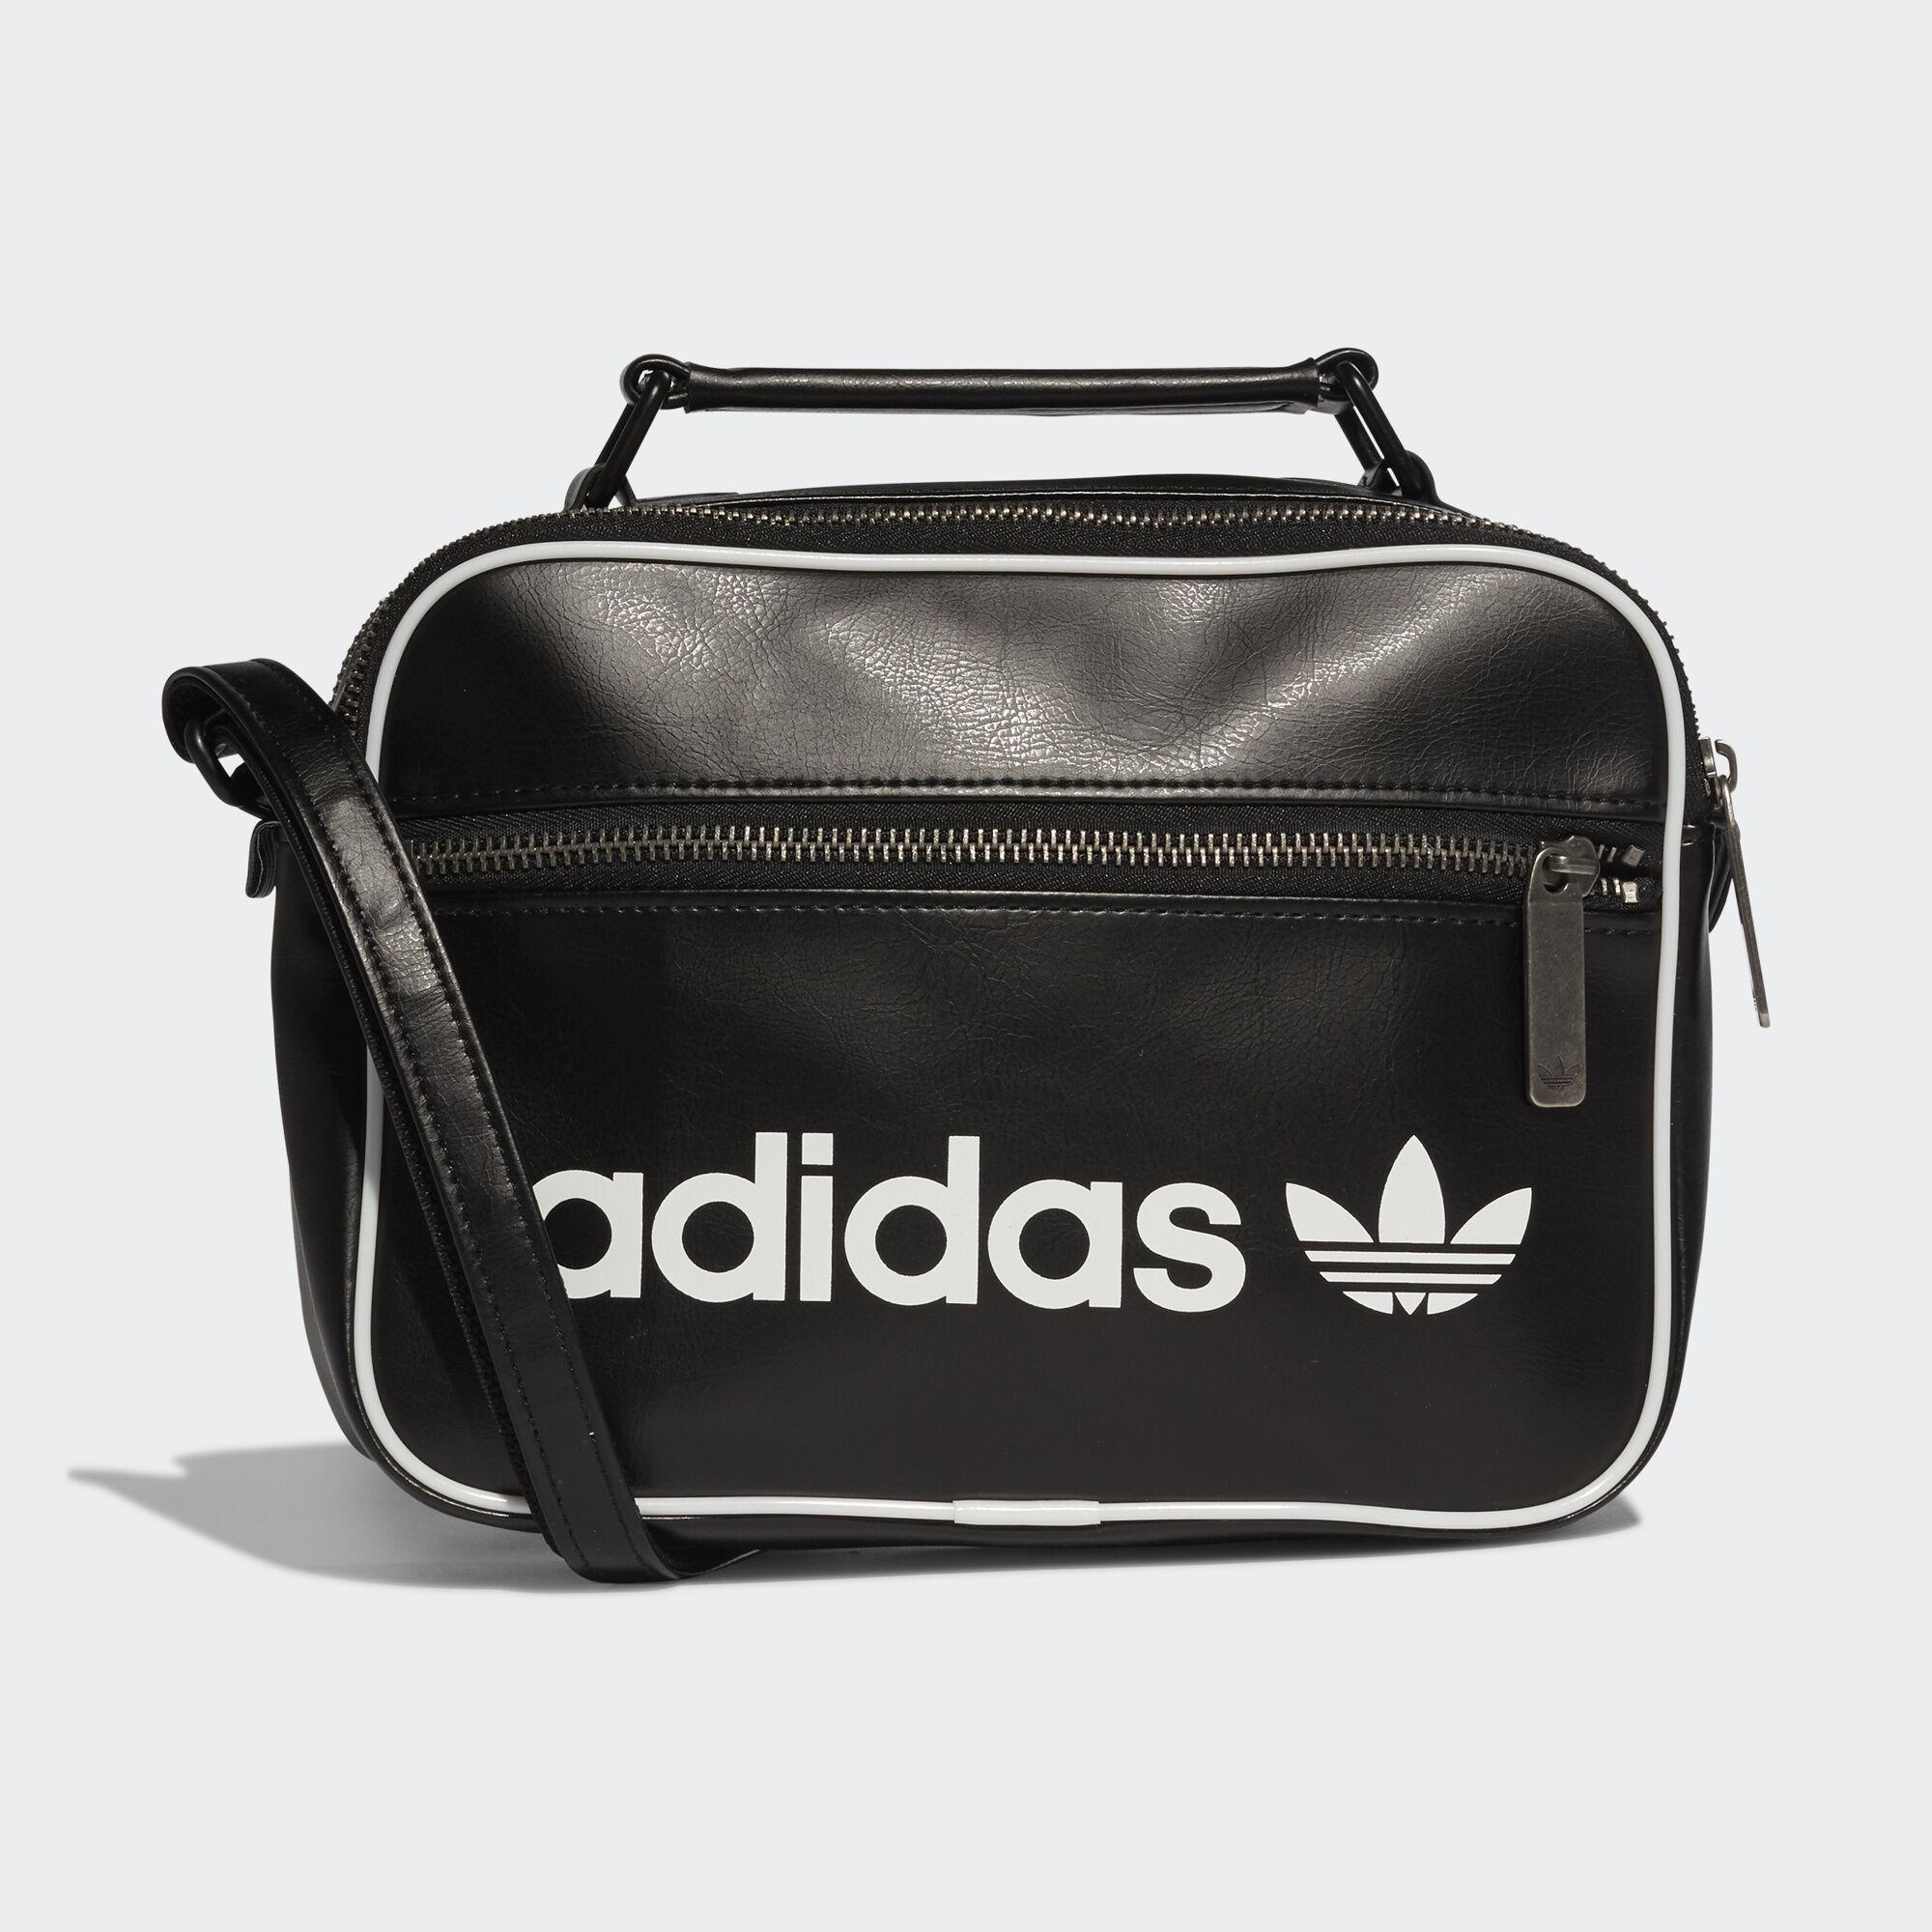 c899fb76d316 Buy adidas handbags   OFF64% Discounted